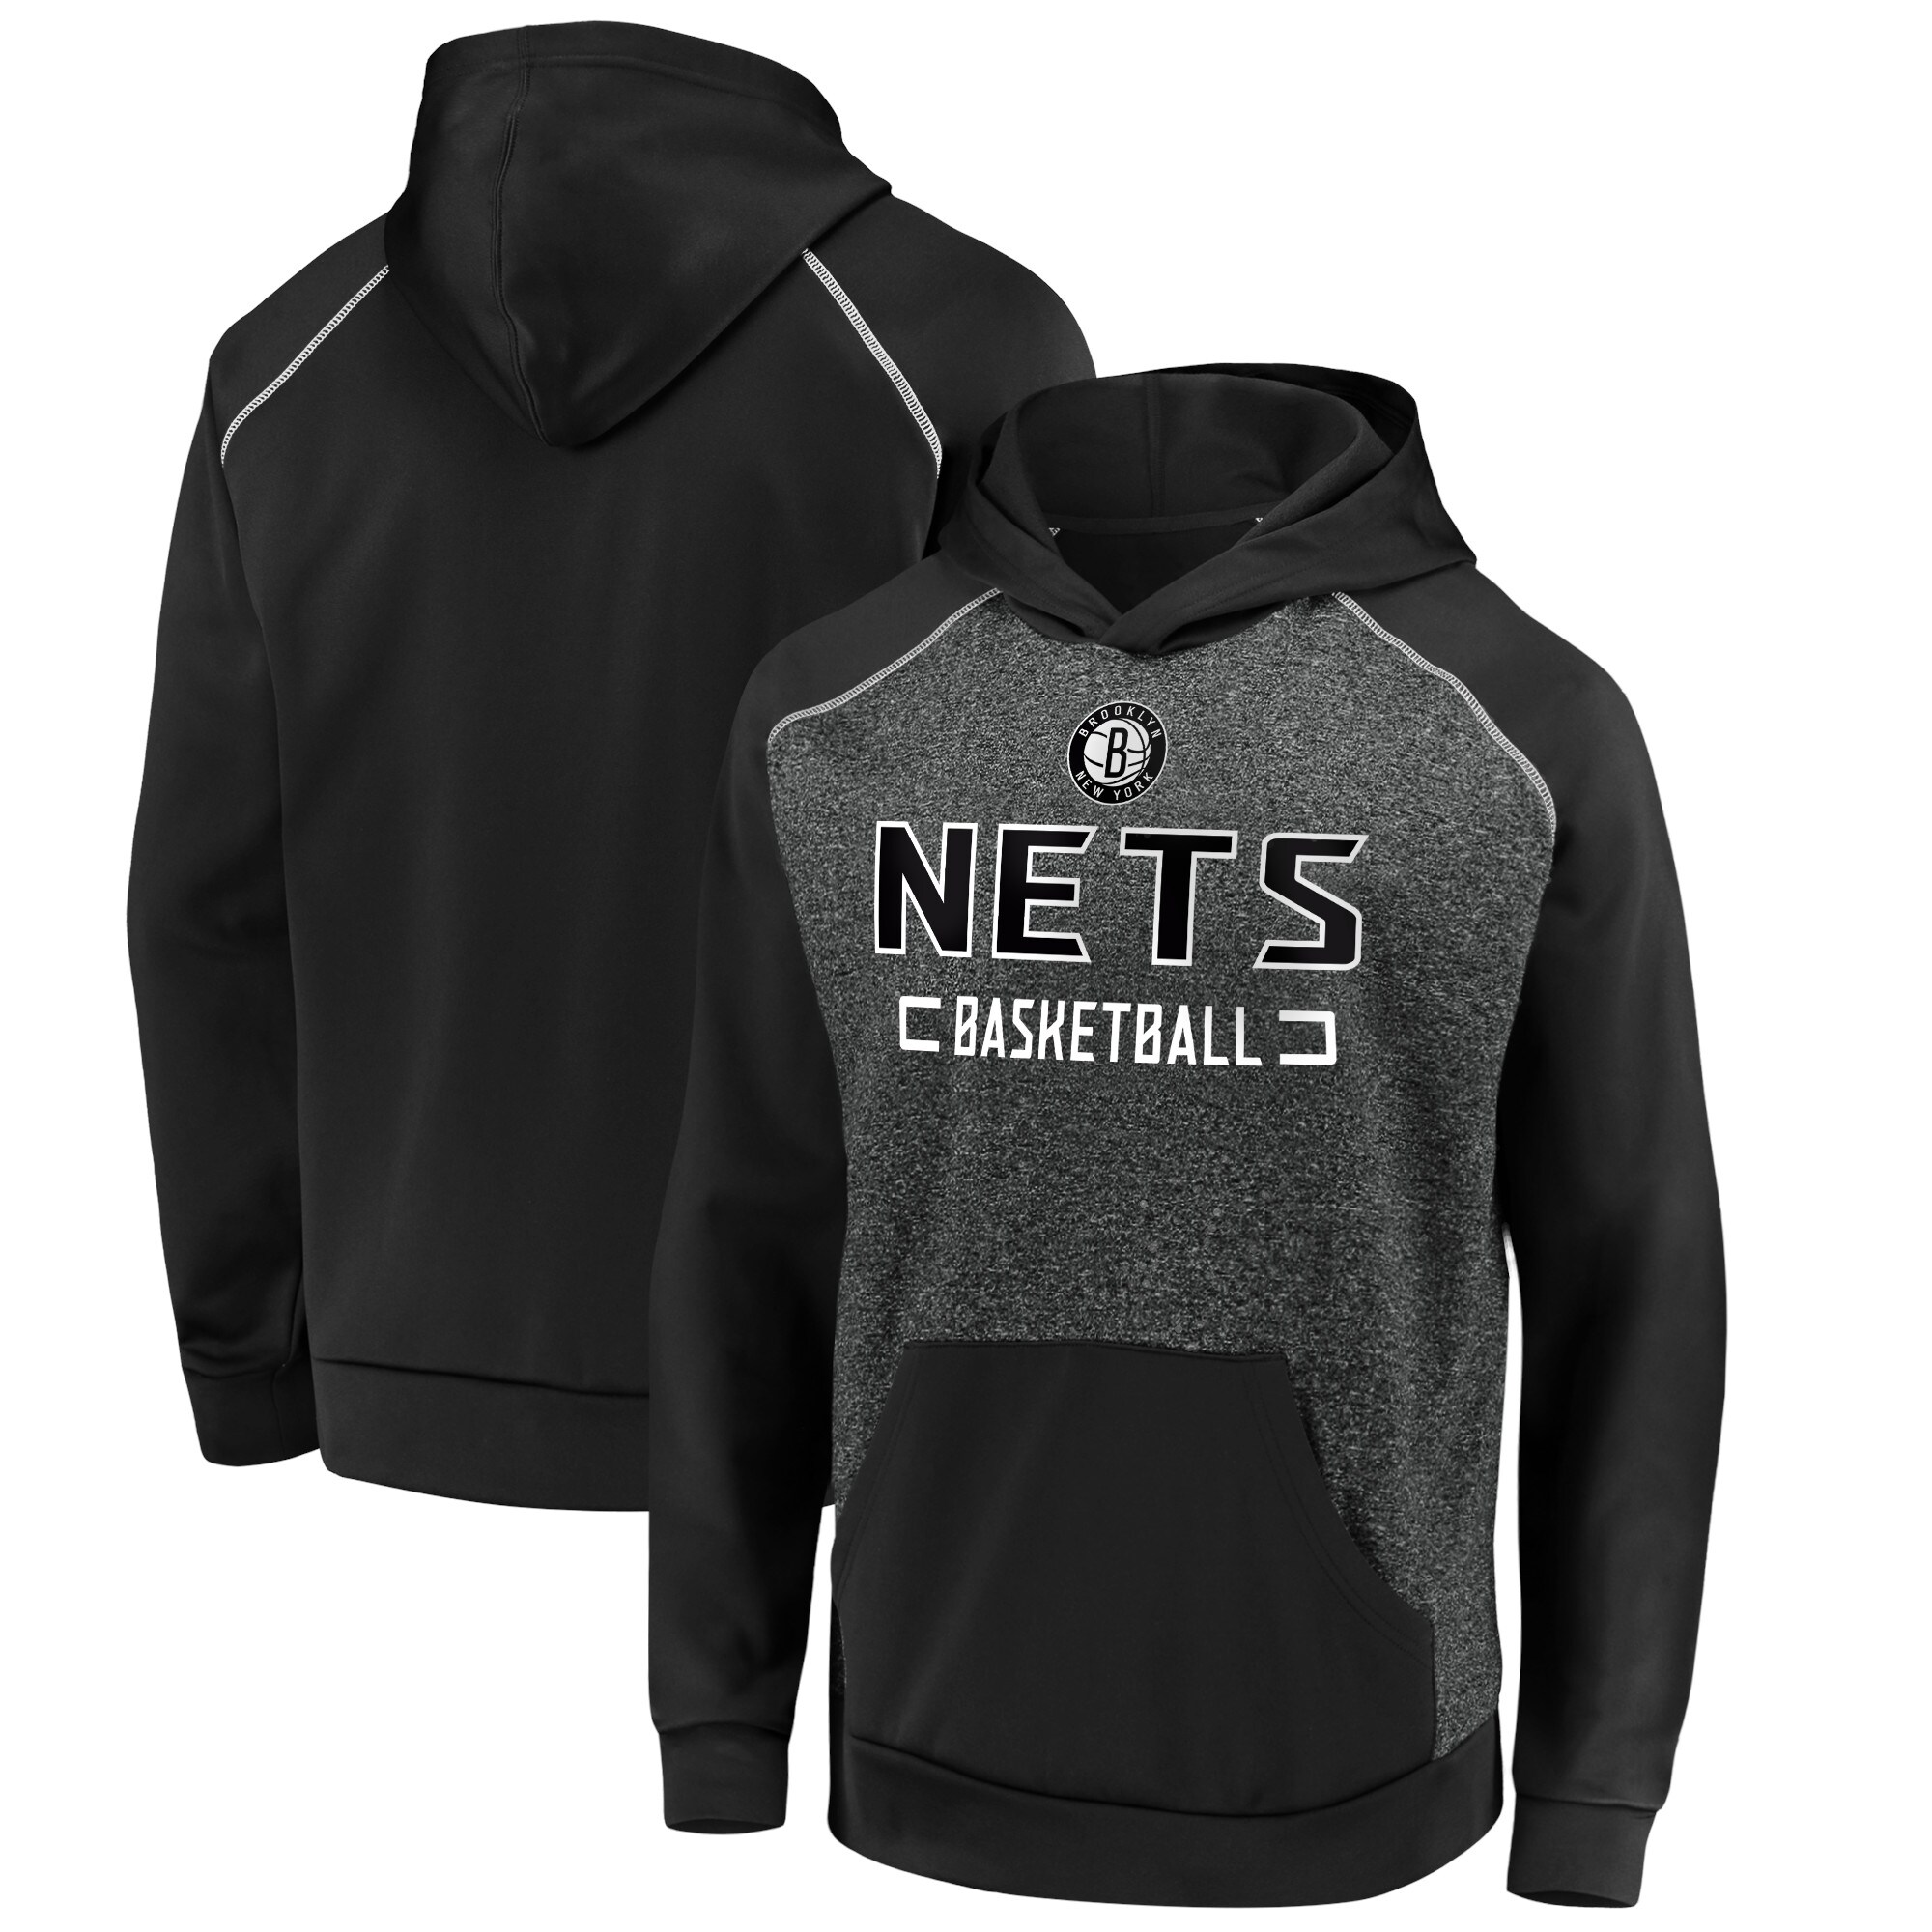 Brooklyn Nets Fanatics Branded Game Day Ready Raglan Pullover Hoodie - Heathered Charcoal/Black